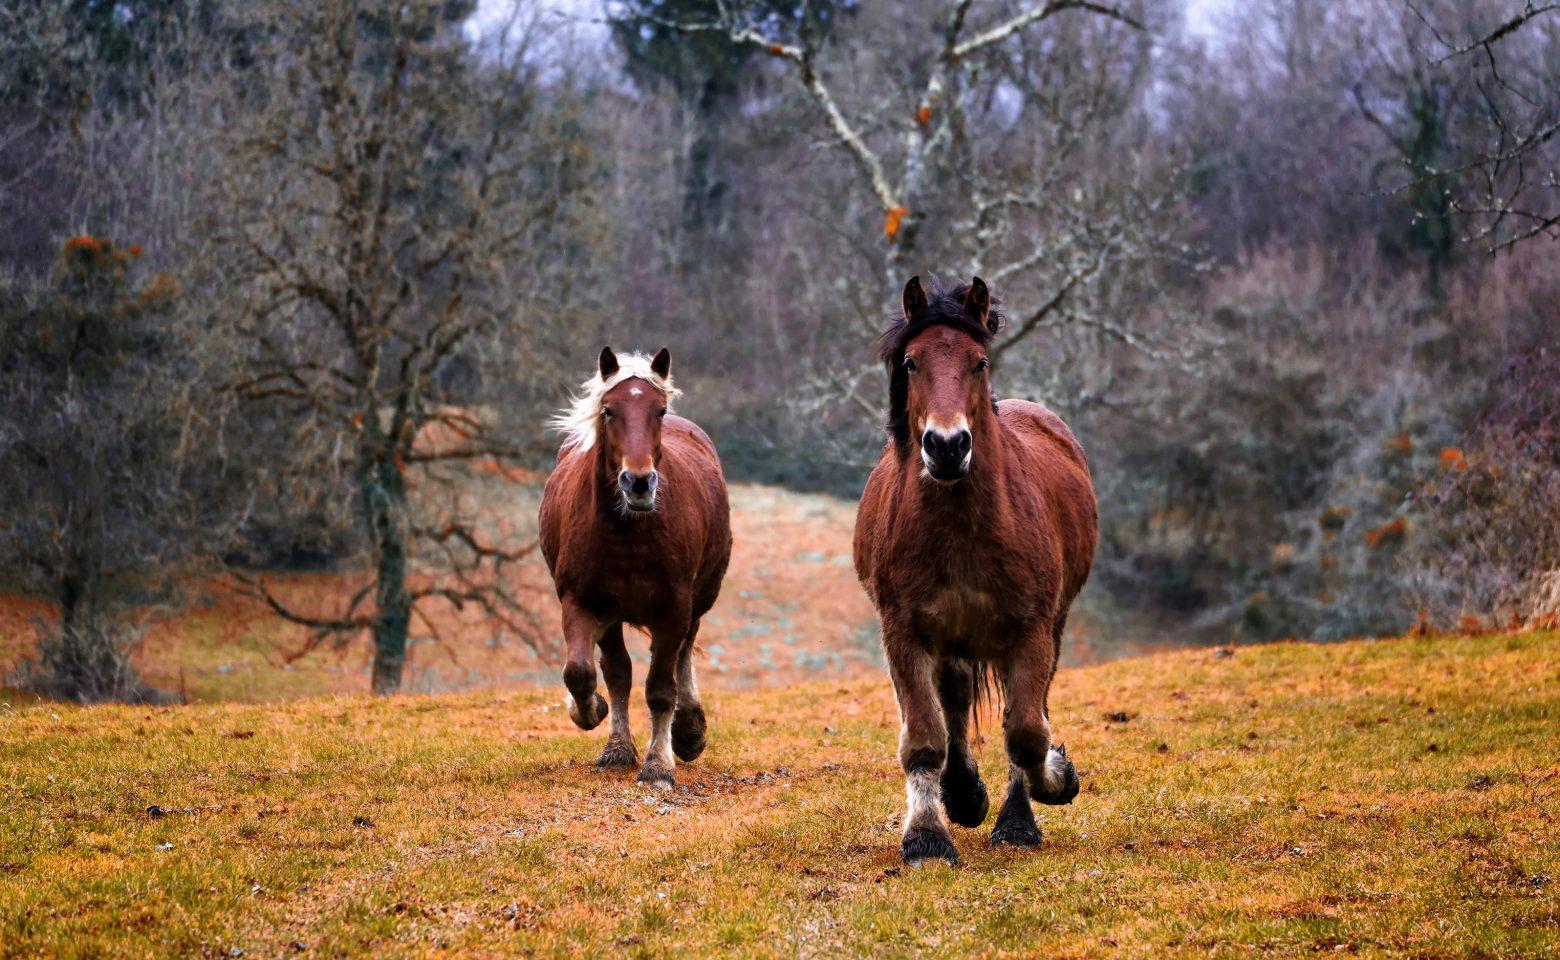 horses-1984977